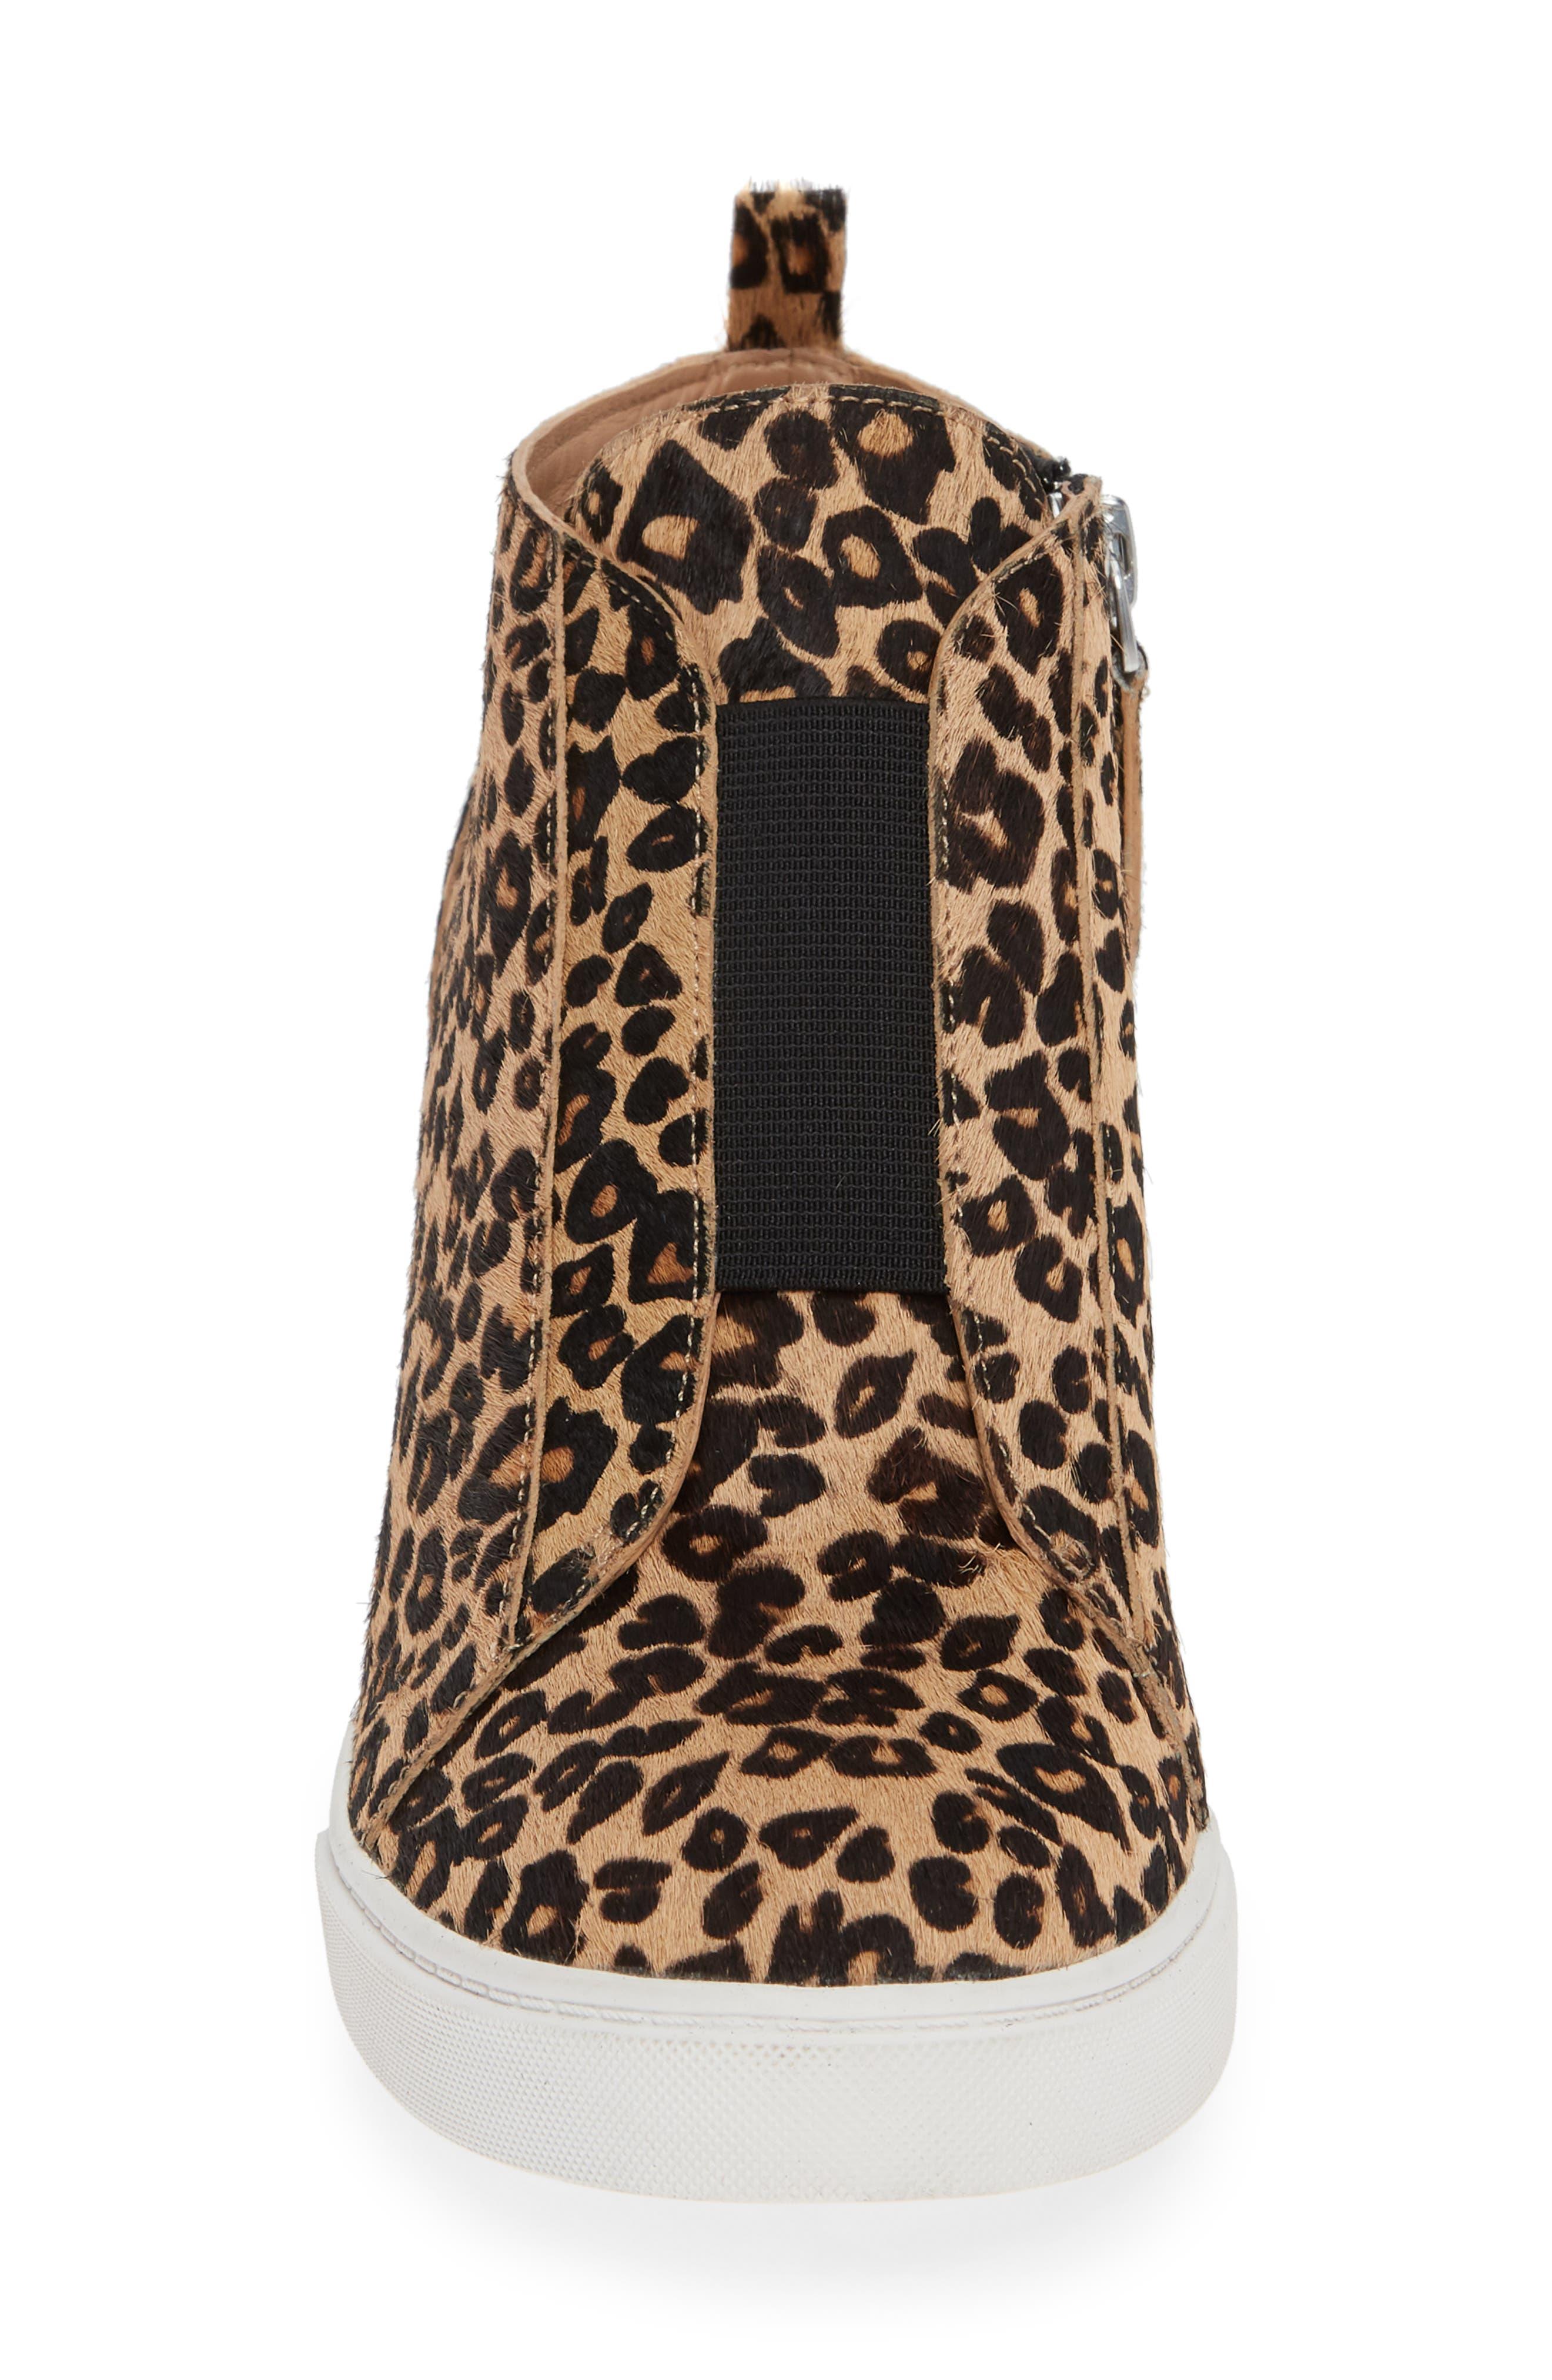 LINEA PAOLO, Felicia III Genuine Calf Hair Wedge Sneaker, Alternate thumbnail 4, color, LEOPARD PRINT HAIR CALF